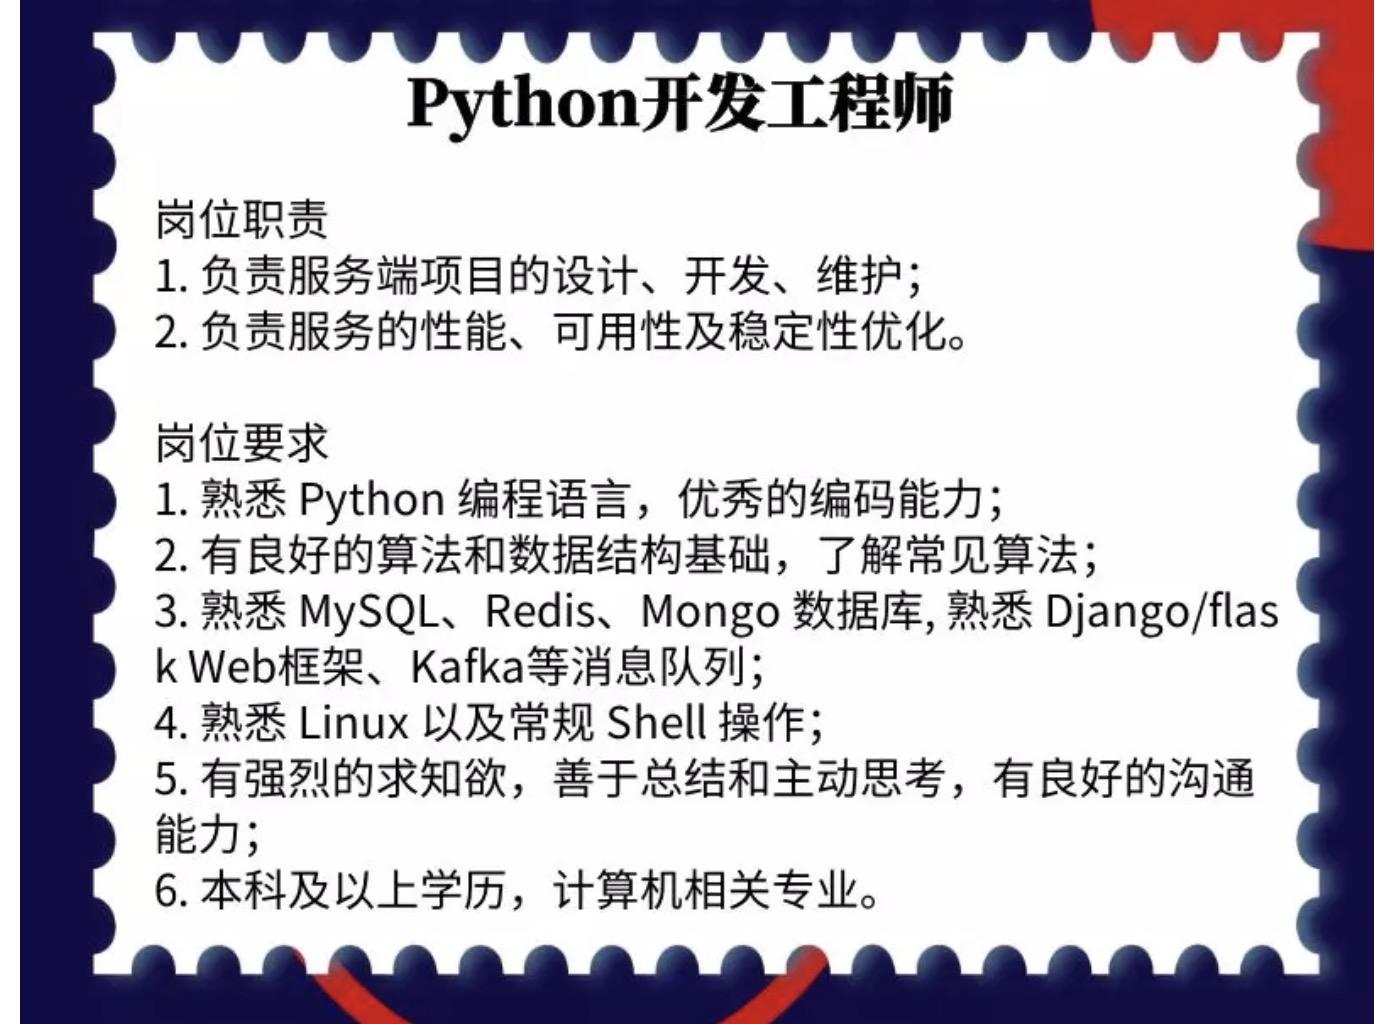 https://momo-mmsrc.oss-cn-hangzhou.aliyuncs.com/img-8aced63e-6df2-3d49-9134-1f97ce7fe163.jpeg